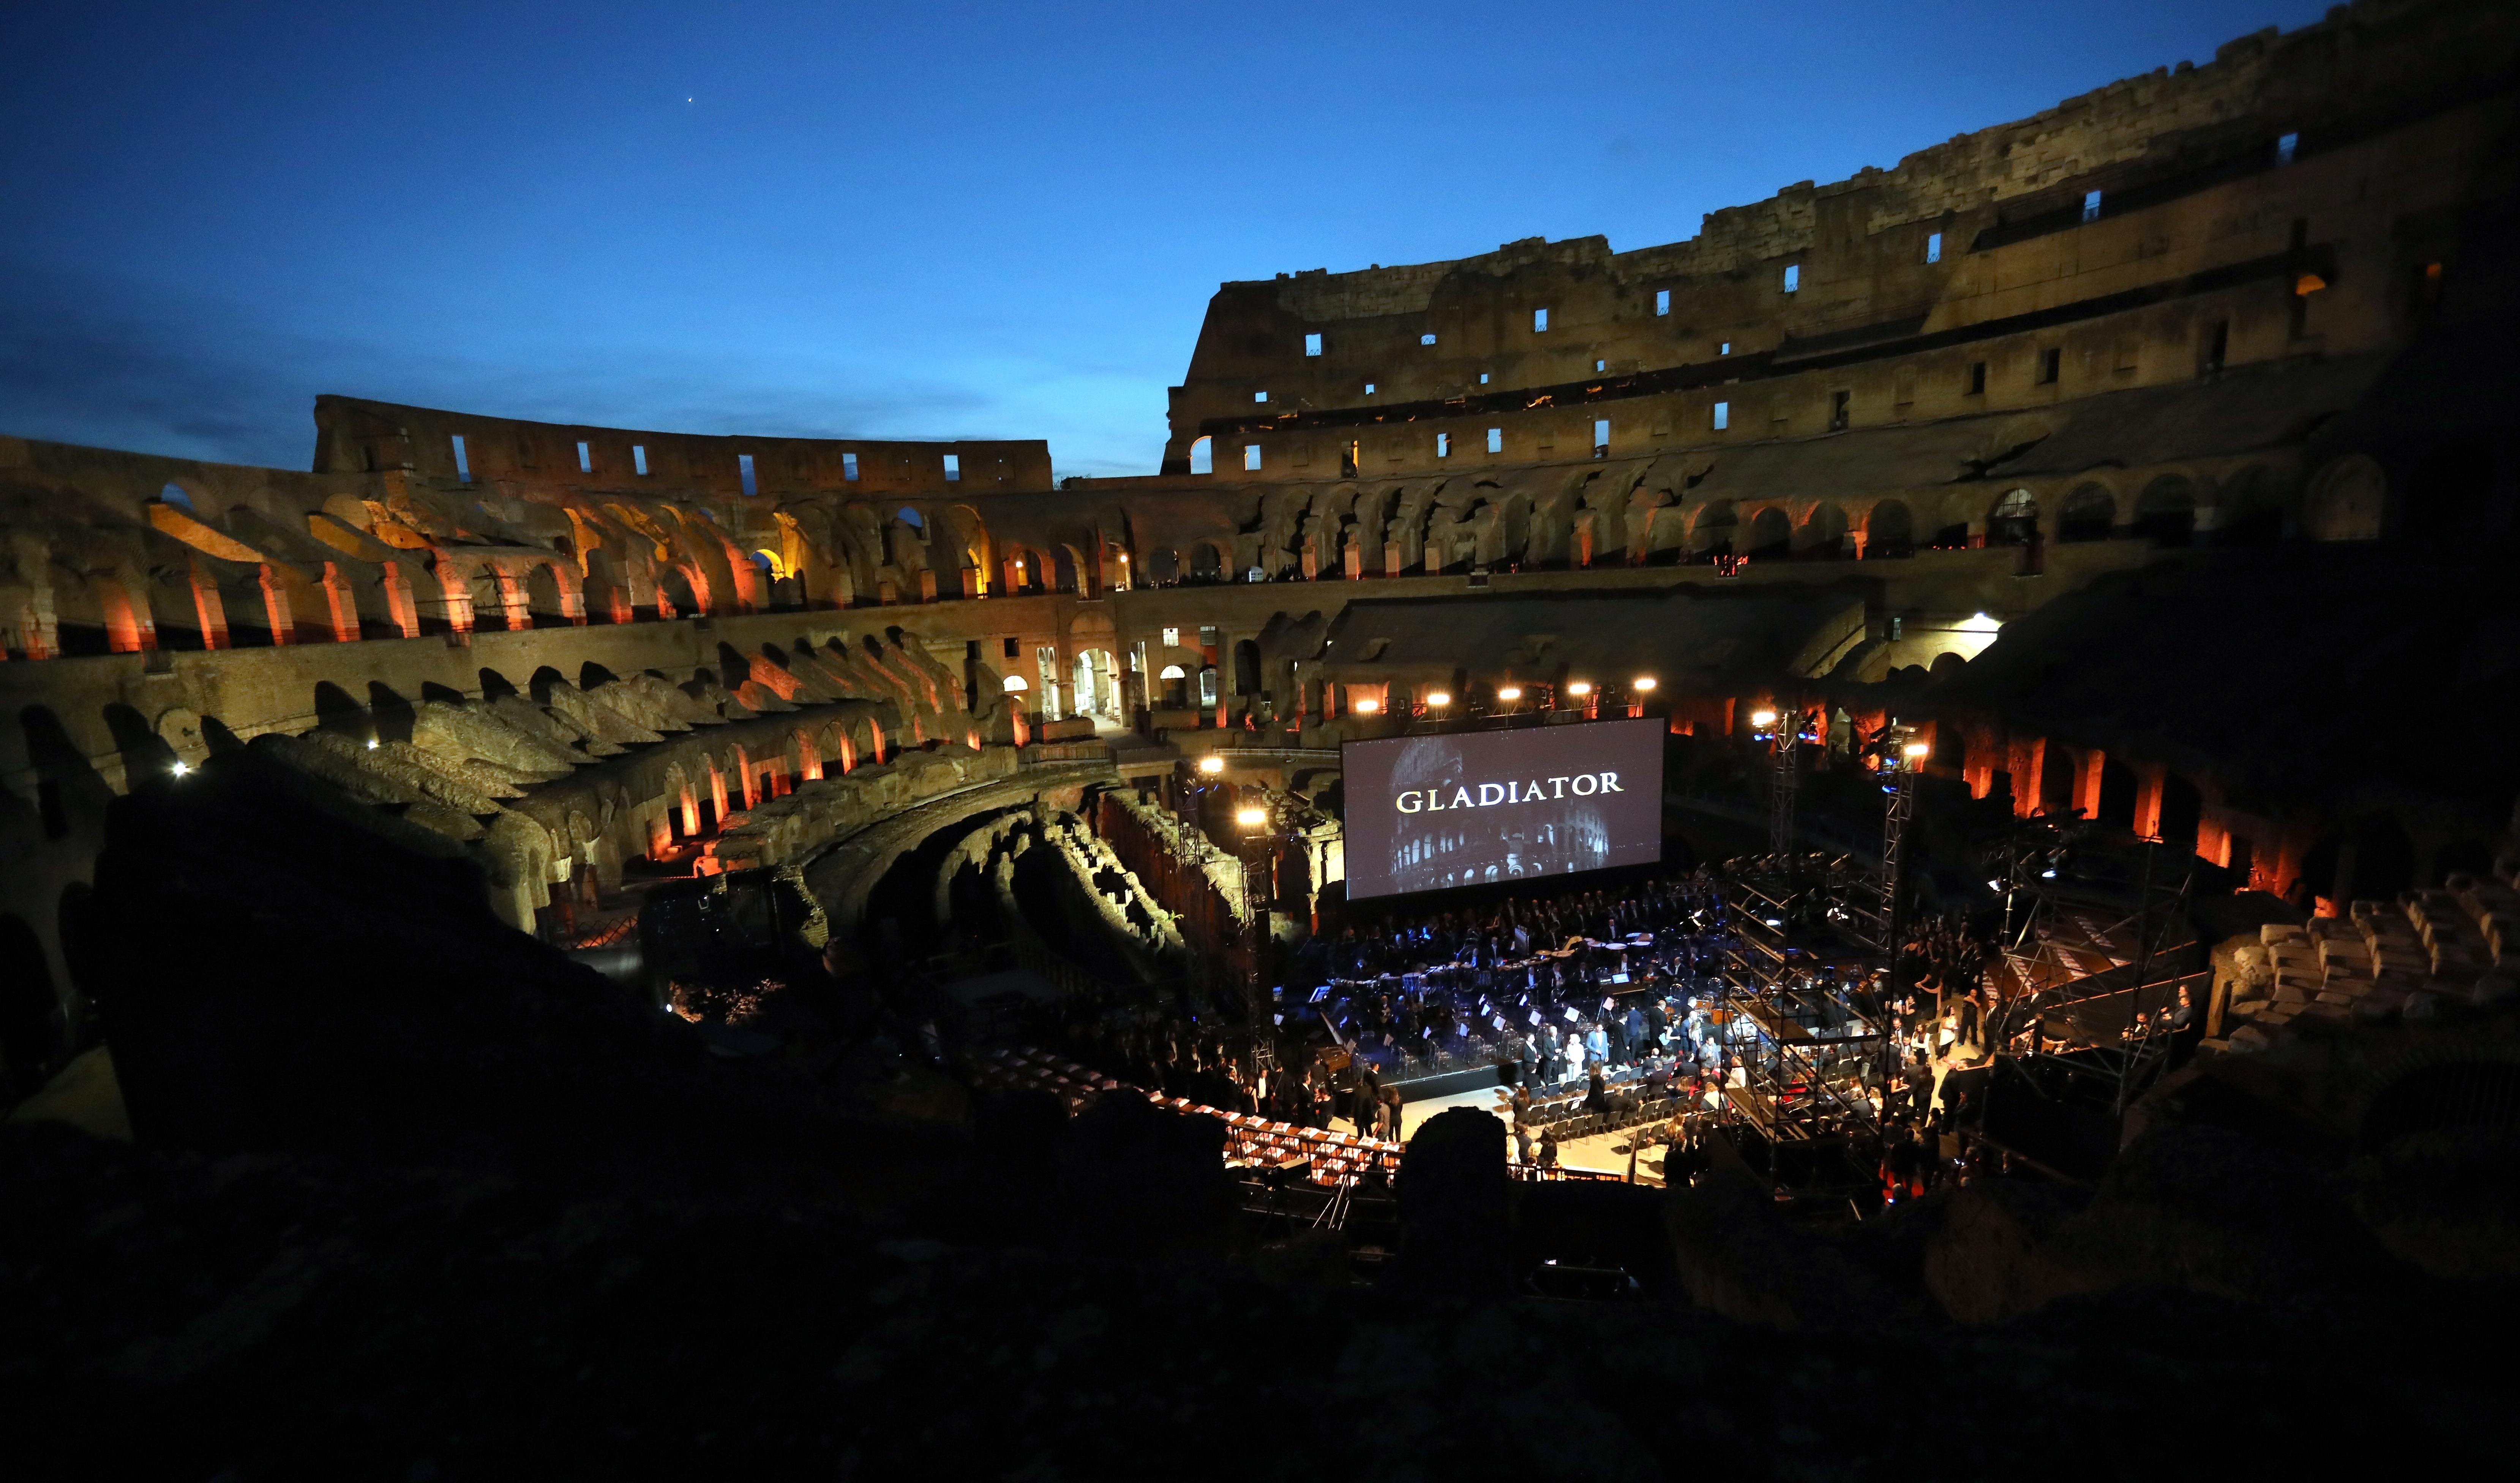 Il Gladiatore In Concerto (Gladiator The Concert) - Charity Night At Colosseum In Rome